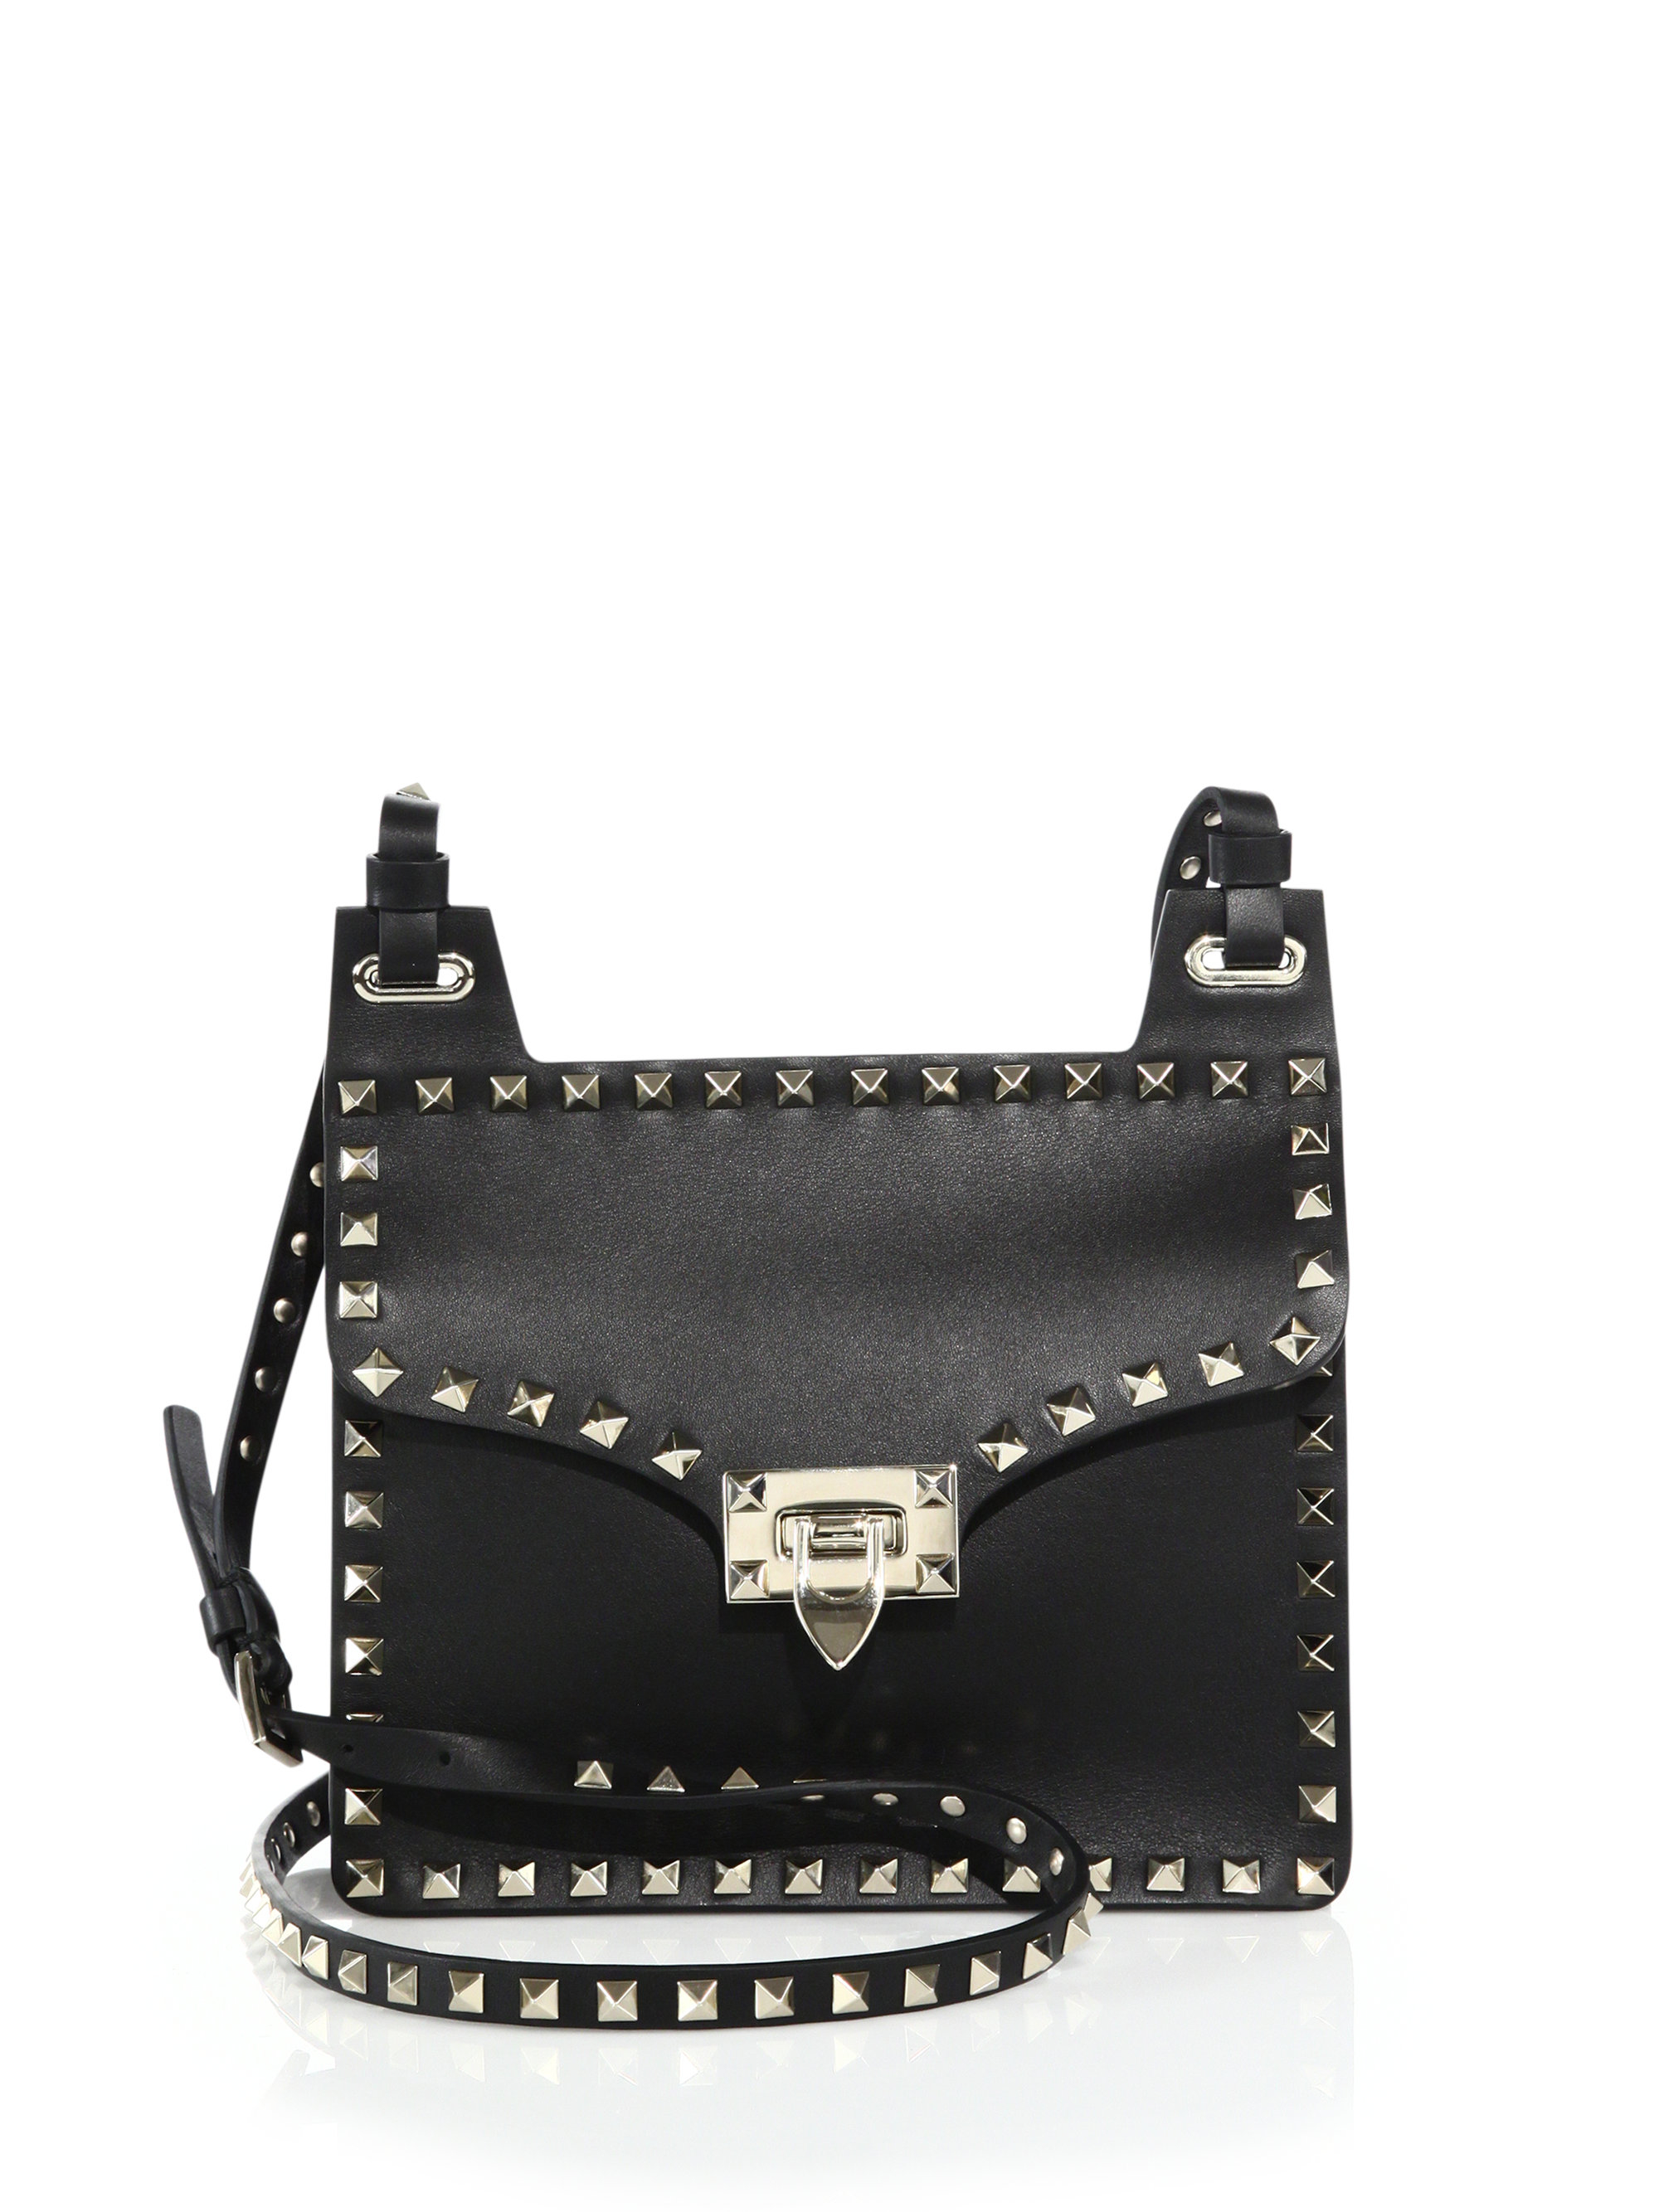 5bd9b3741951 Lyst - Valentino Rockstud Leather Crossbody Bag in Black